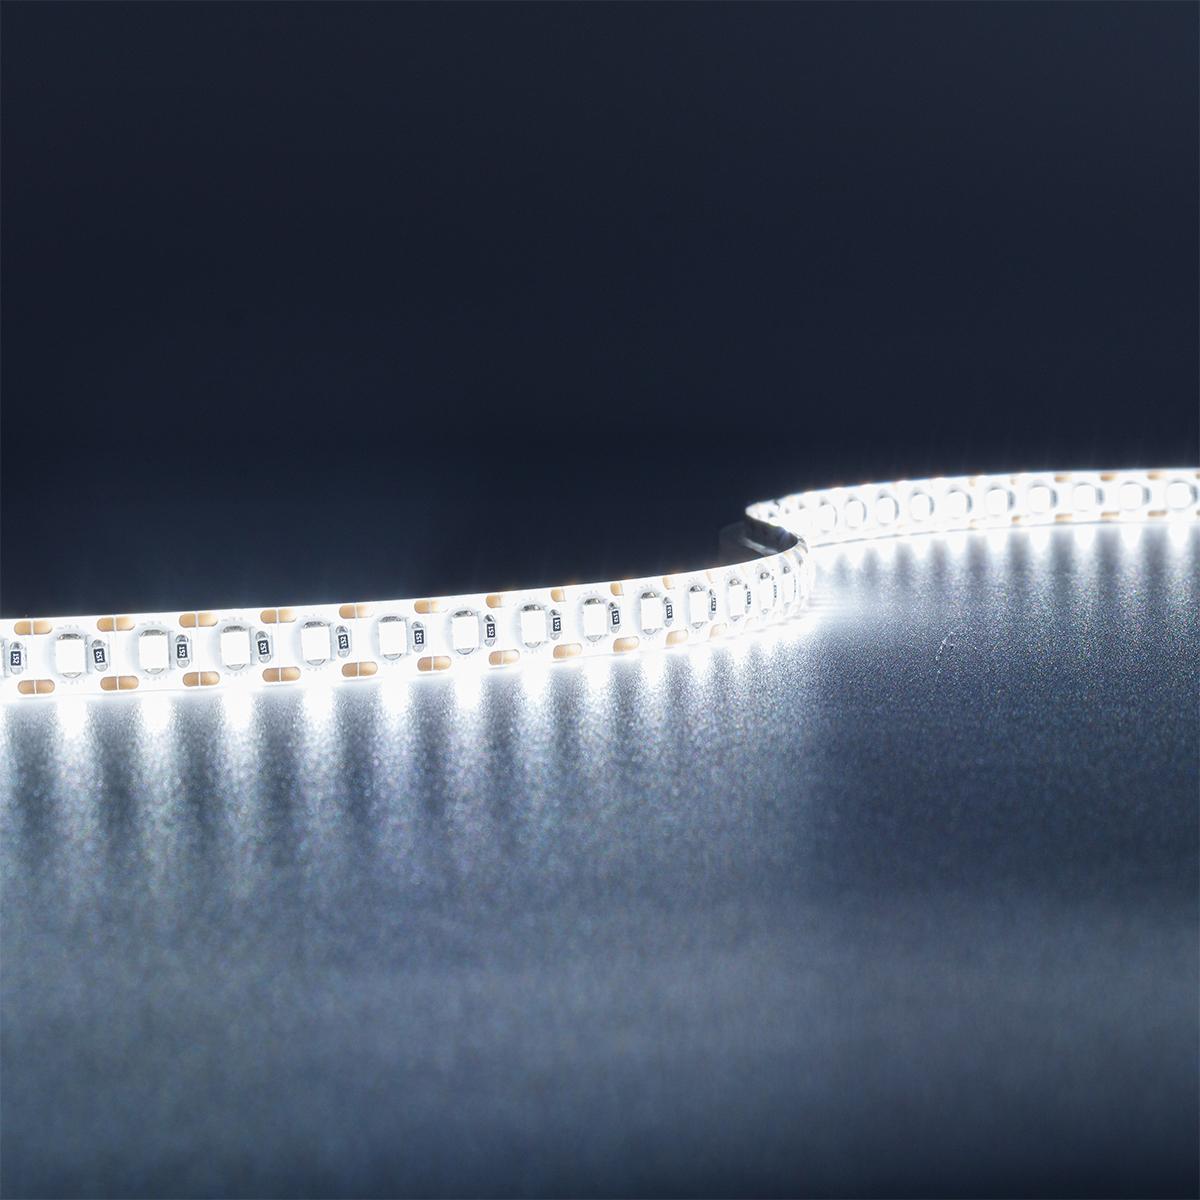 Single Cut Kaltweiß 24V LED Streifen 5M 15W/m 120LED/m 8mm IP65 6000K